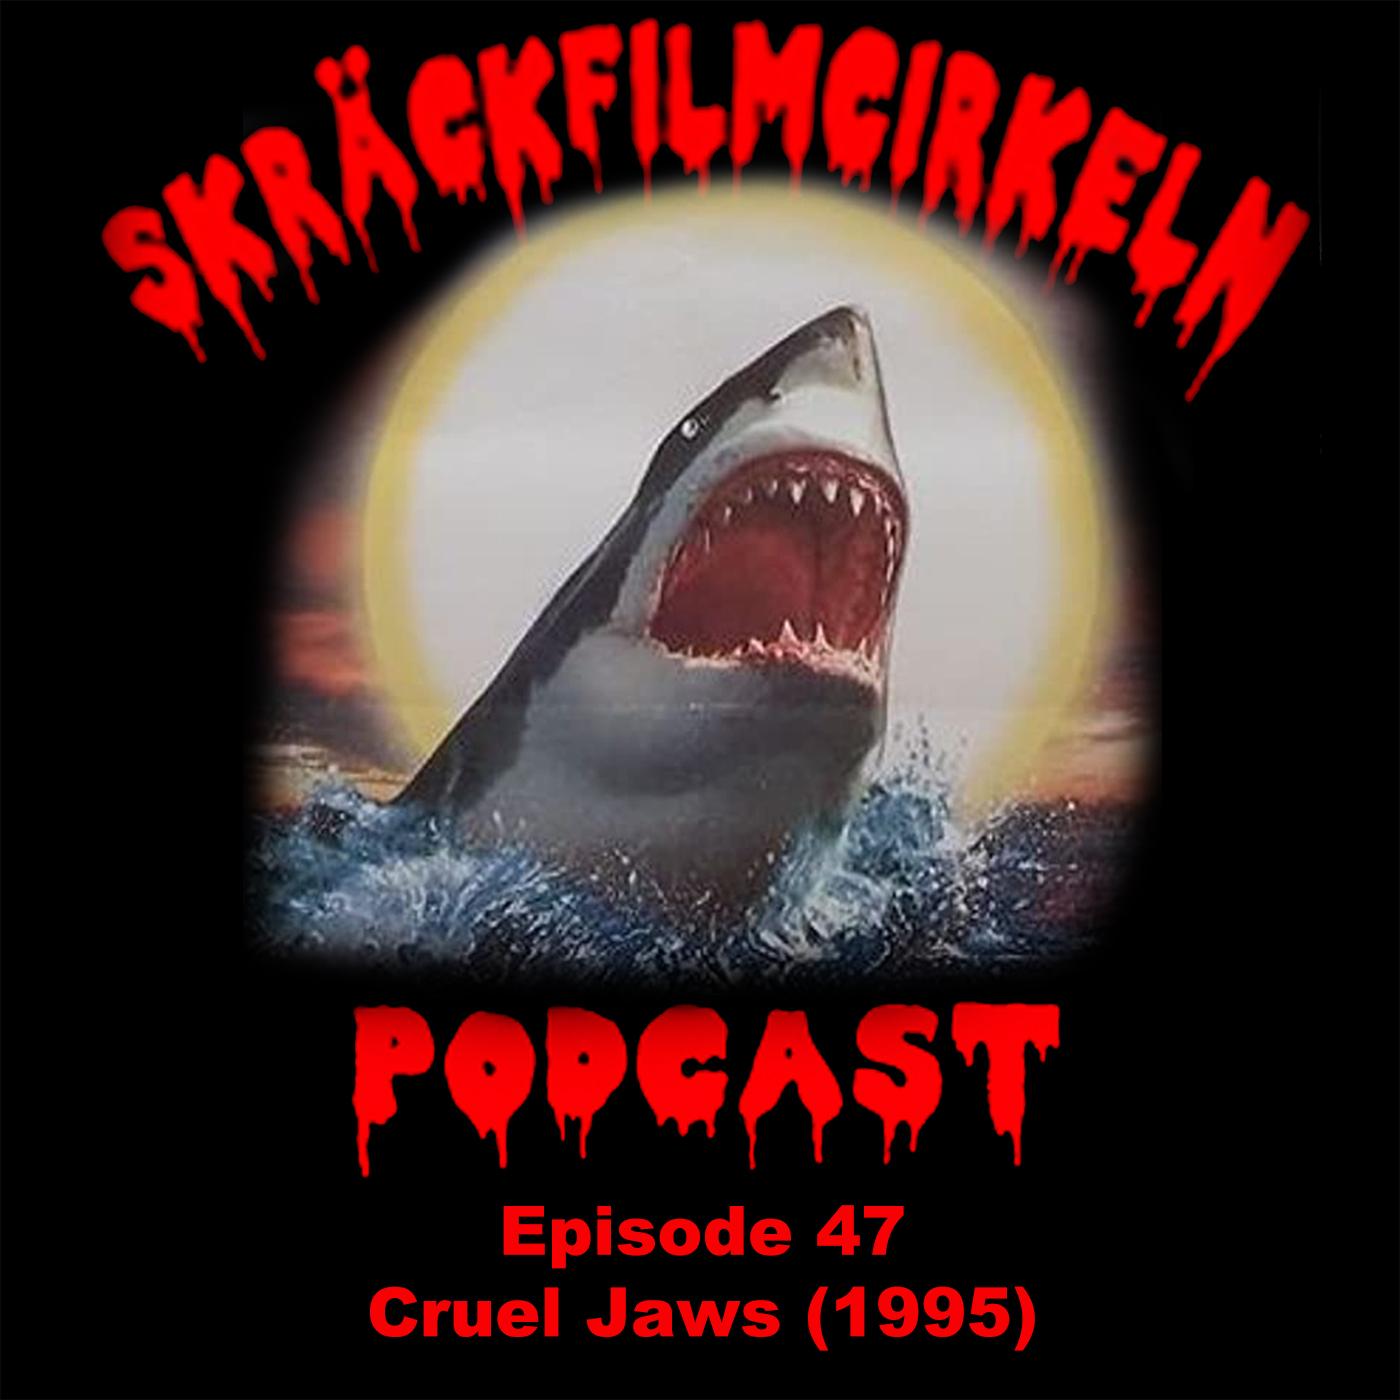 Avsnitt 47 – Cruel Jaws (1995)